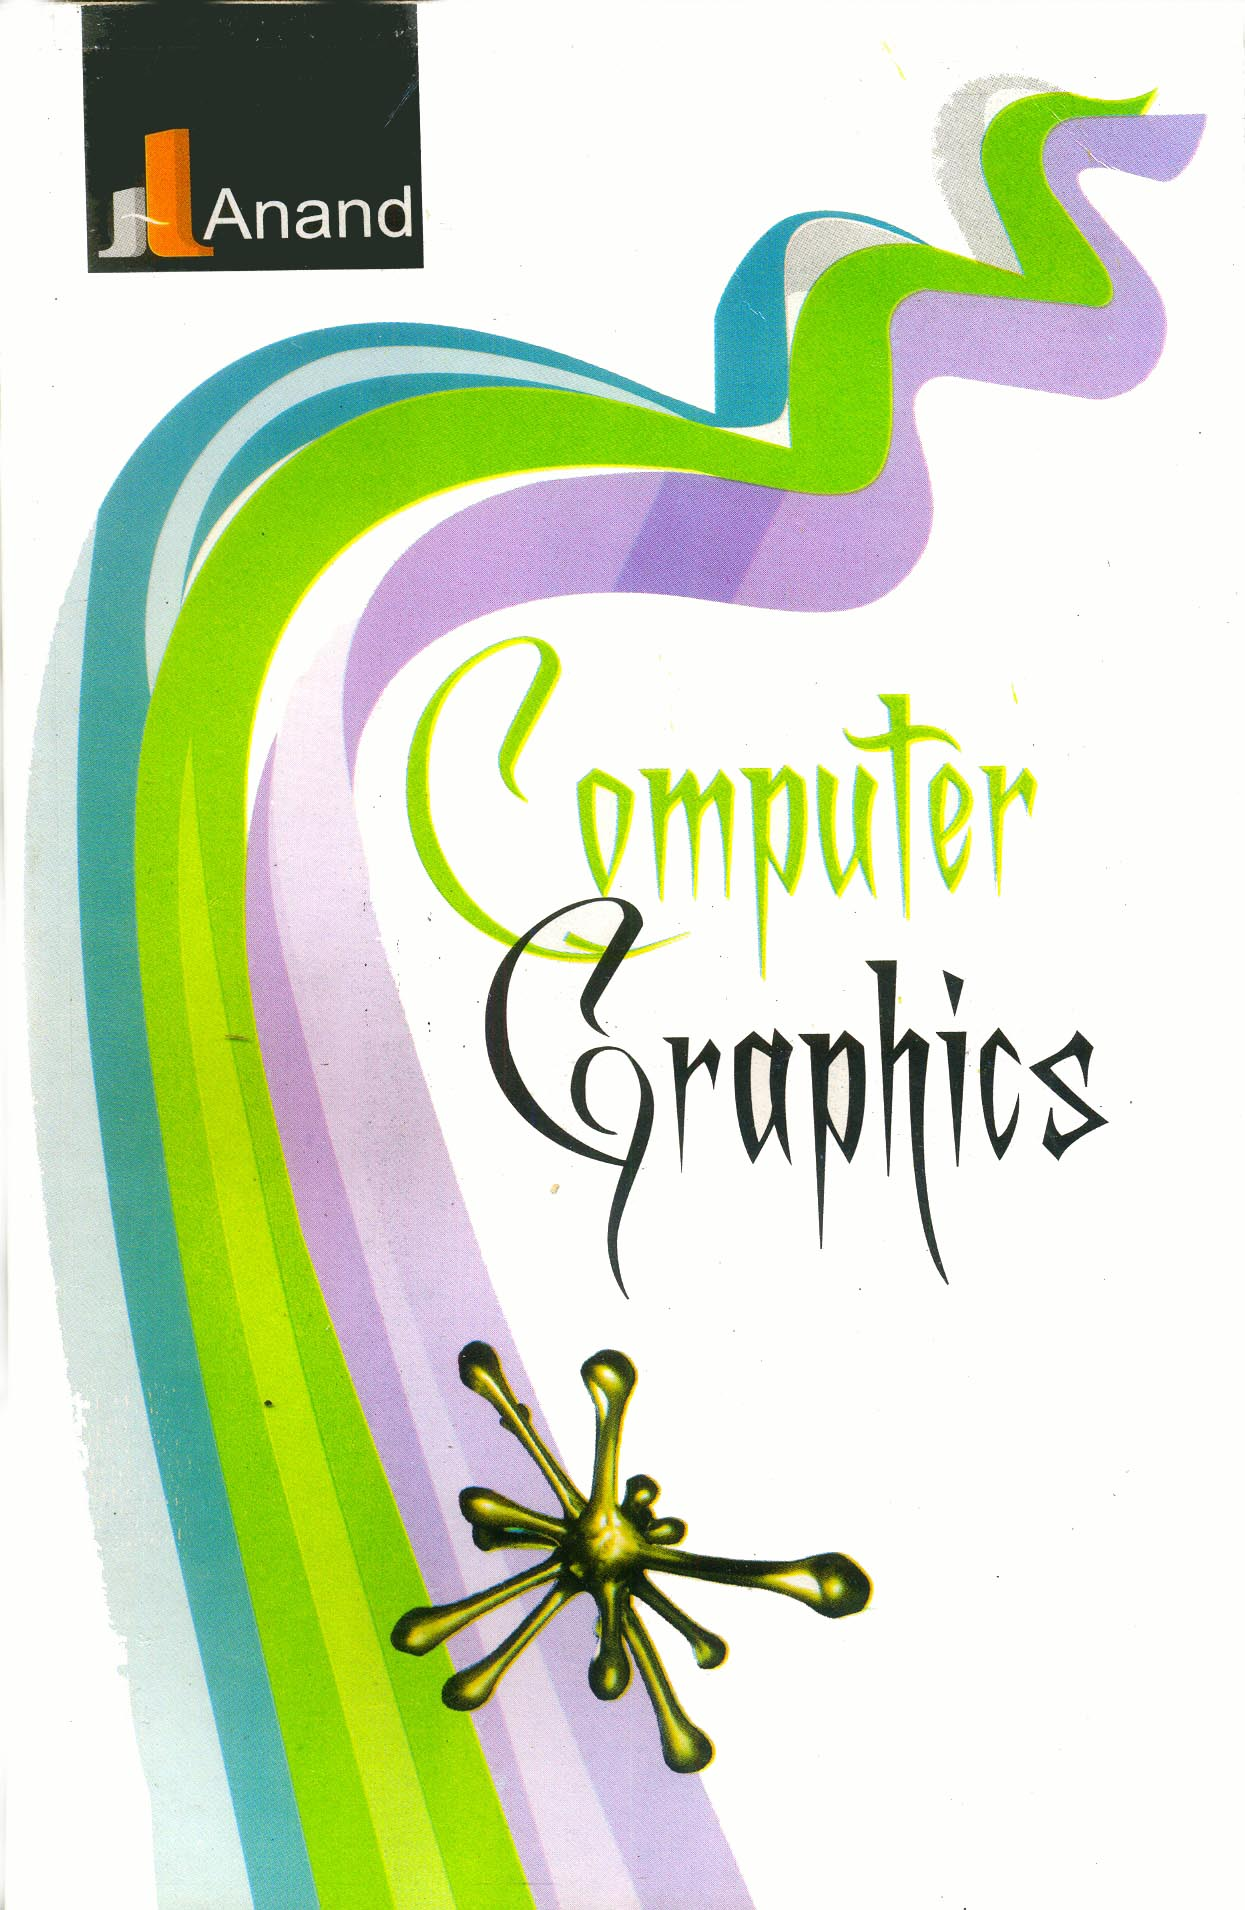 501 COMPUTER GRAPHICS